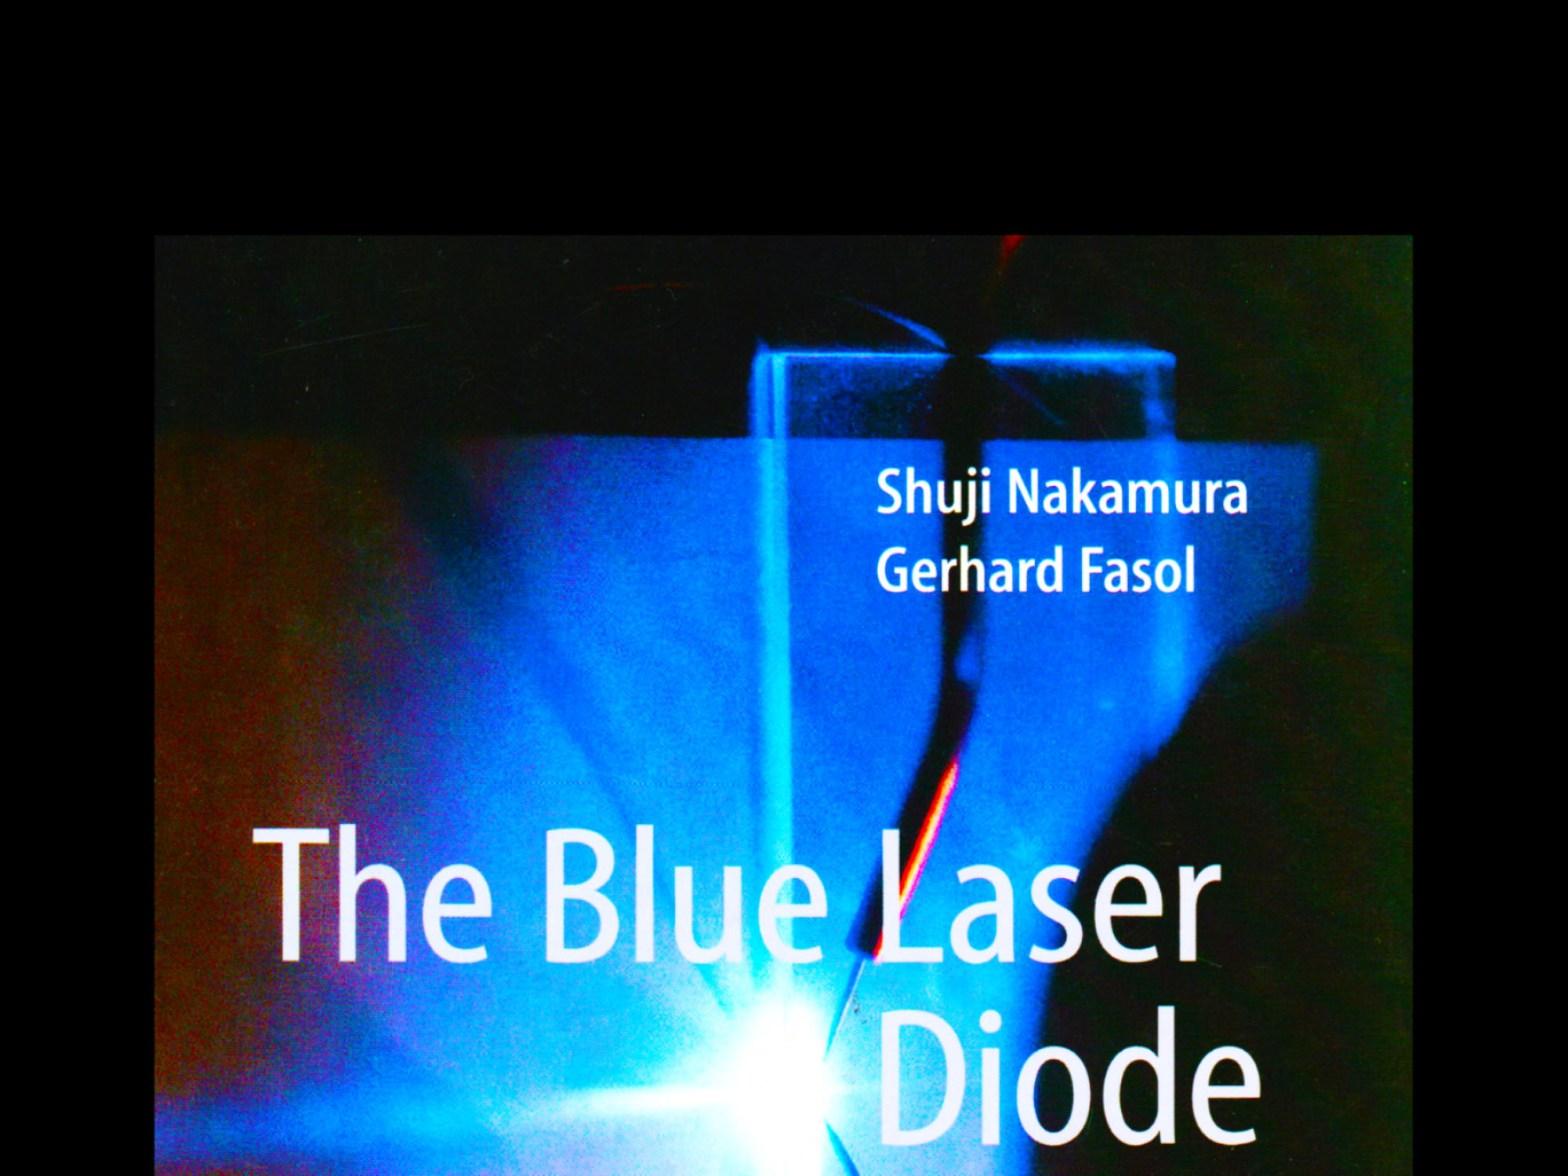 Shuji Nakamura Gerhard Fasol The Blue Laser Diode